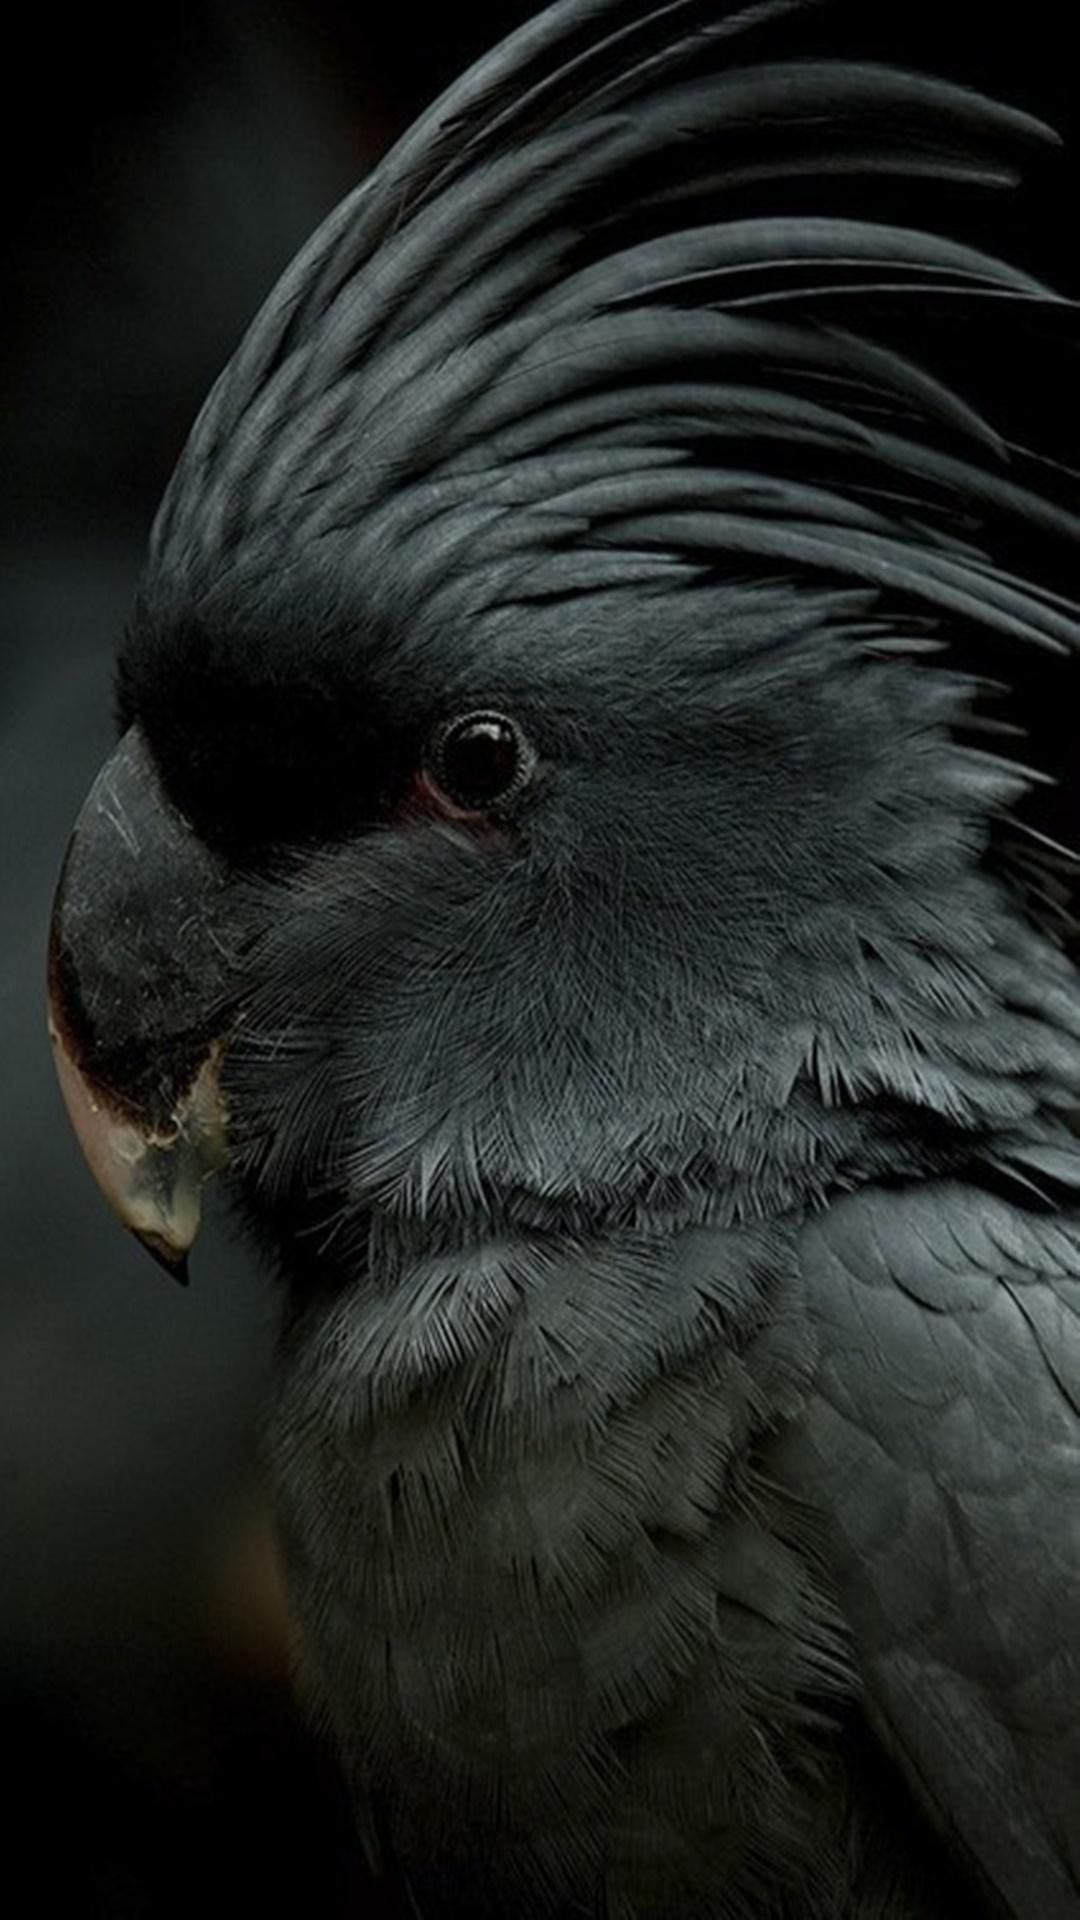 iPhone wallpaper parrot black Parrot